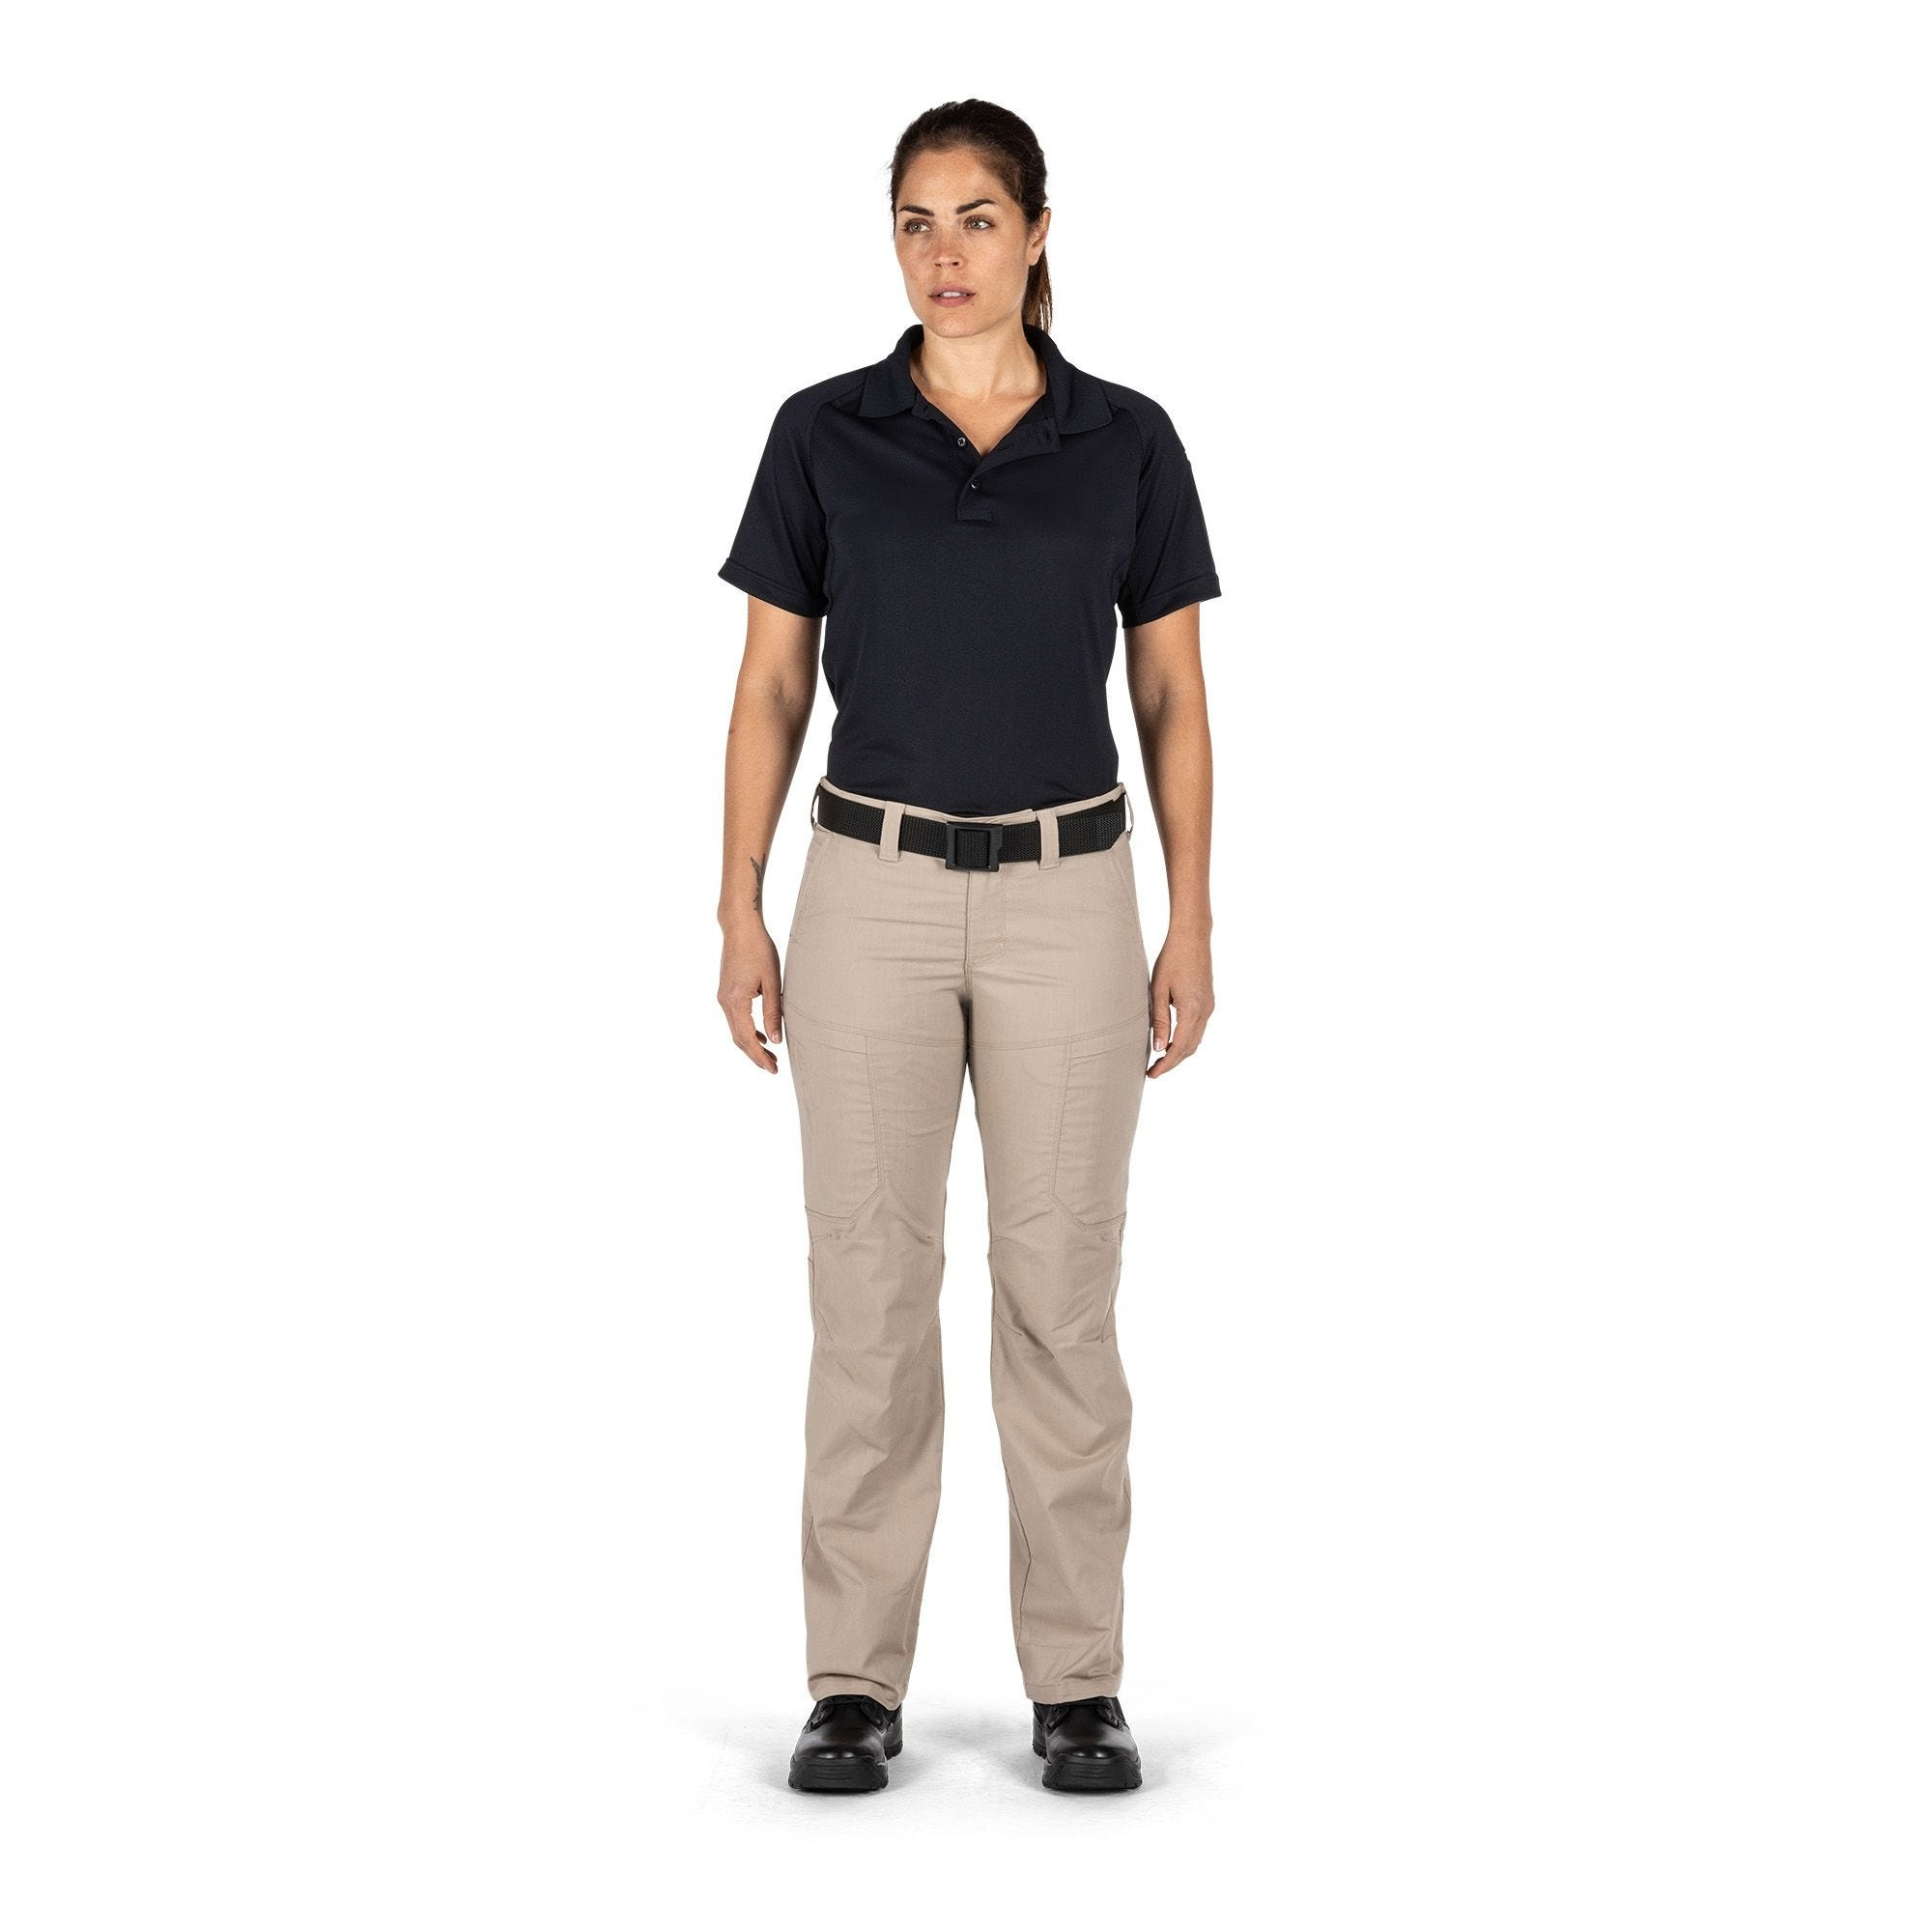 5.11 Tactical 5.11 Tactical Women's 5.11 Apex Pant - Khaki